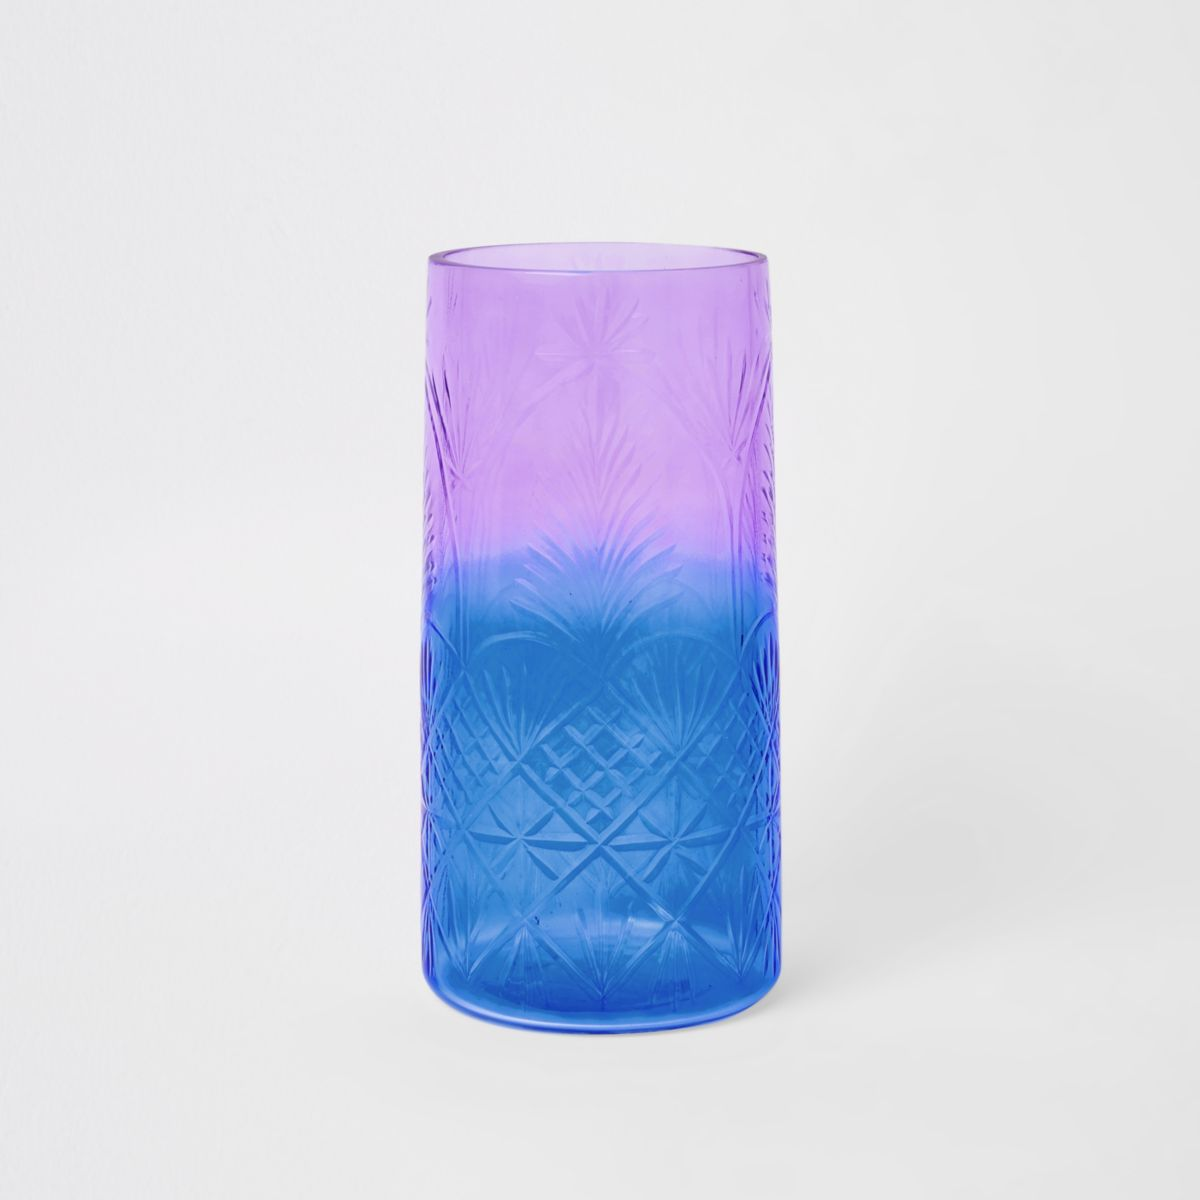 Ombre decorative glass vase